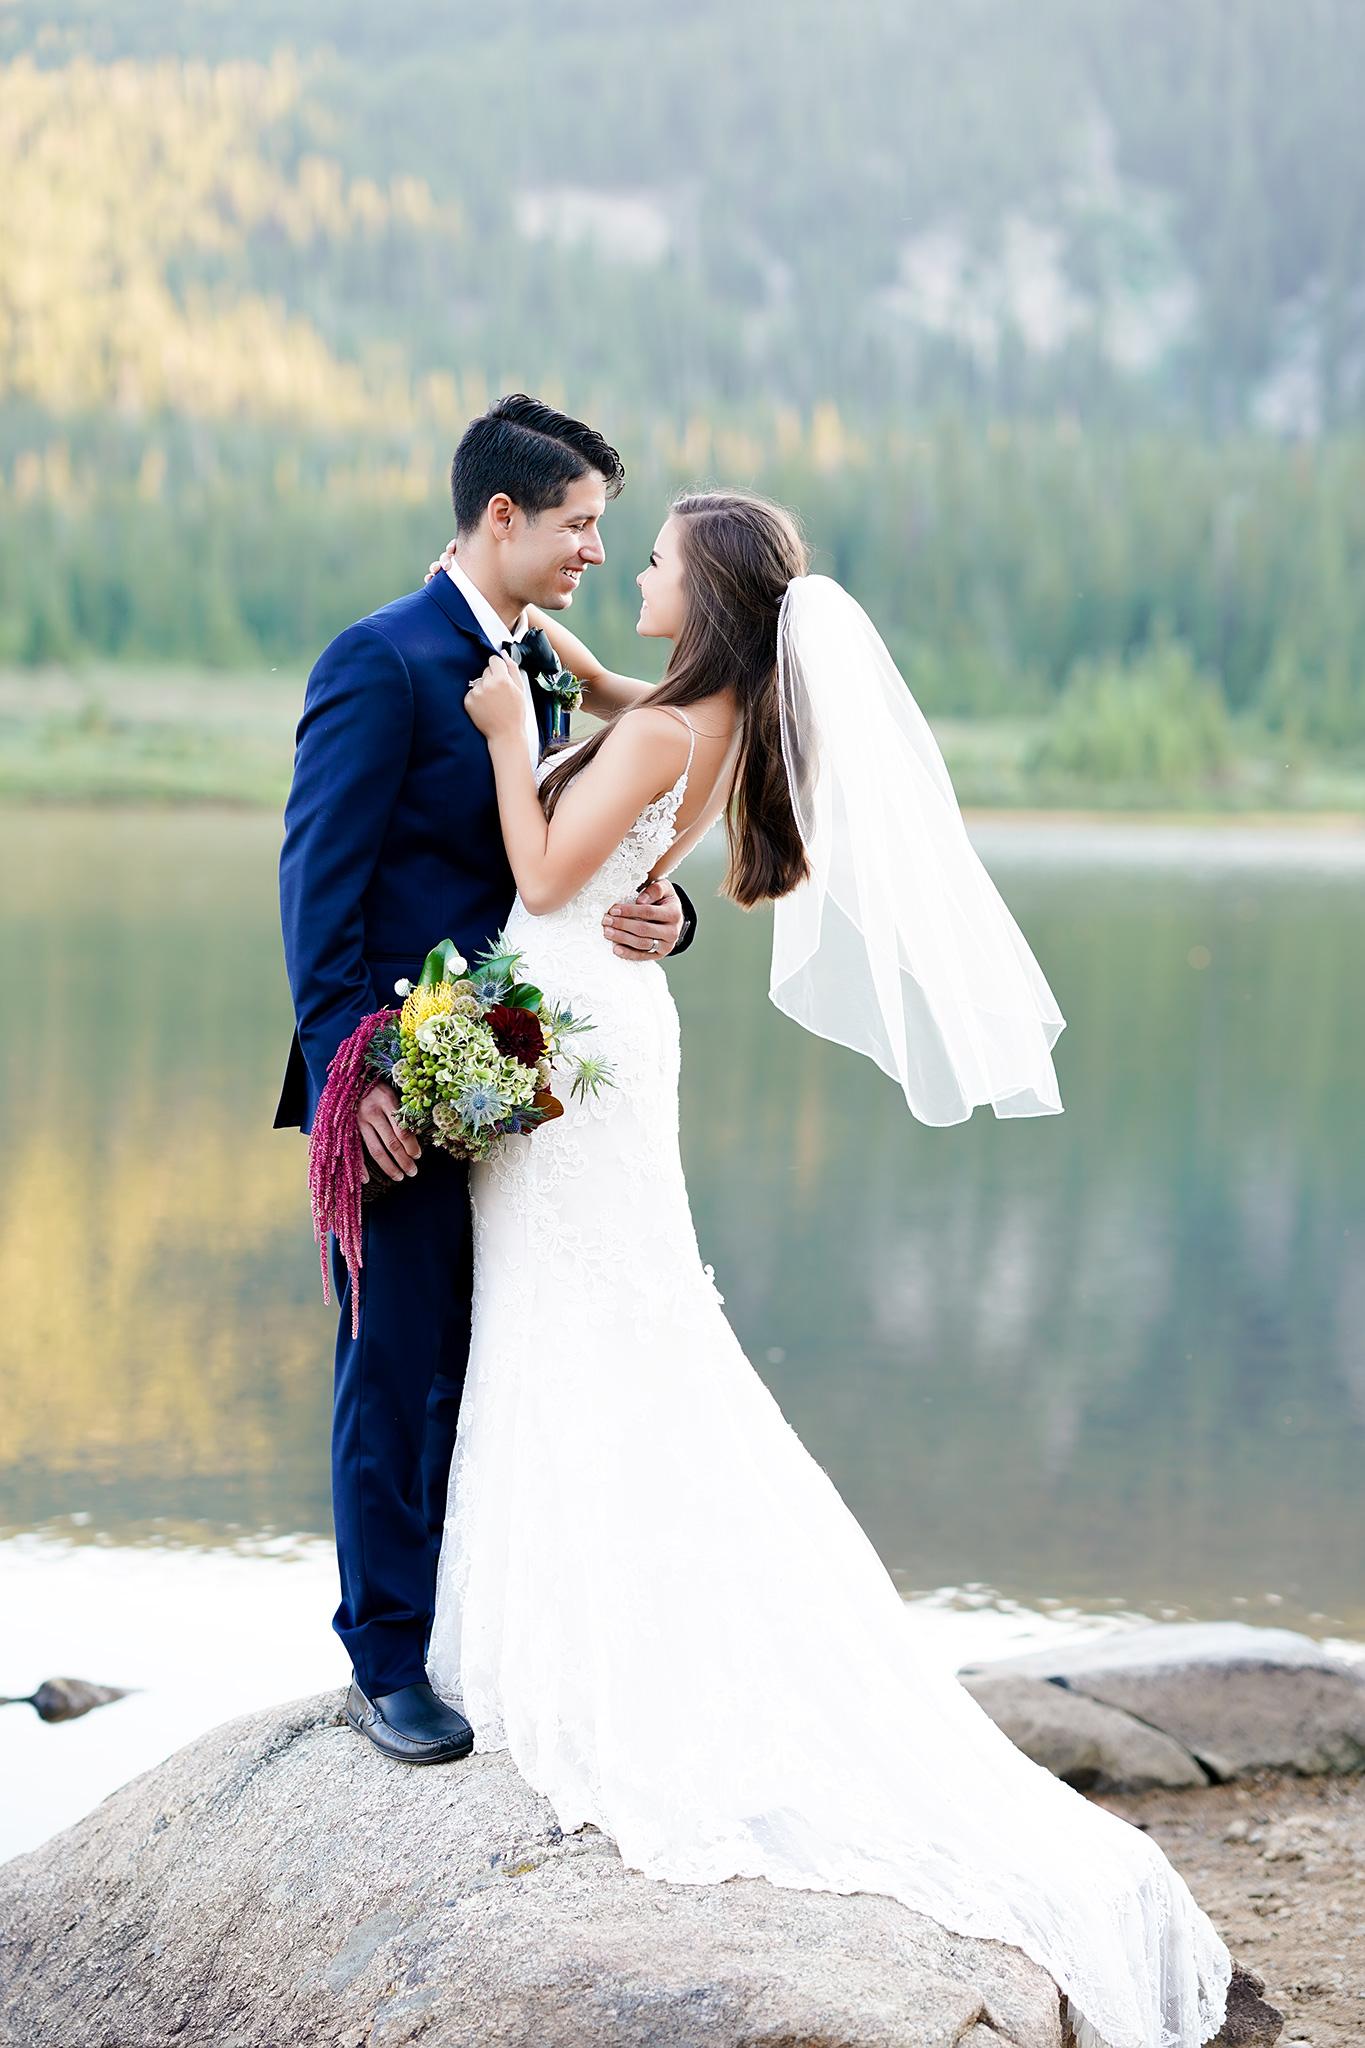 Wedding Photography Websites Inspiration: Rocky Mountain Wedding Inspiration